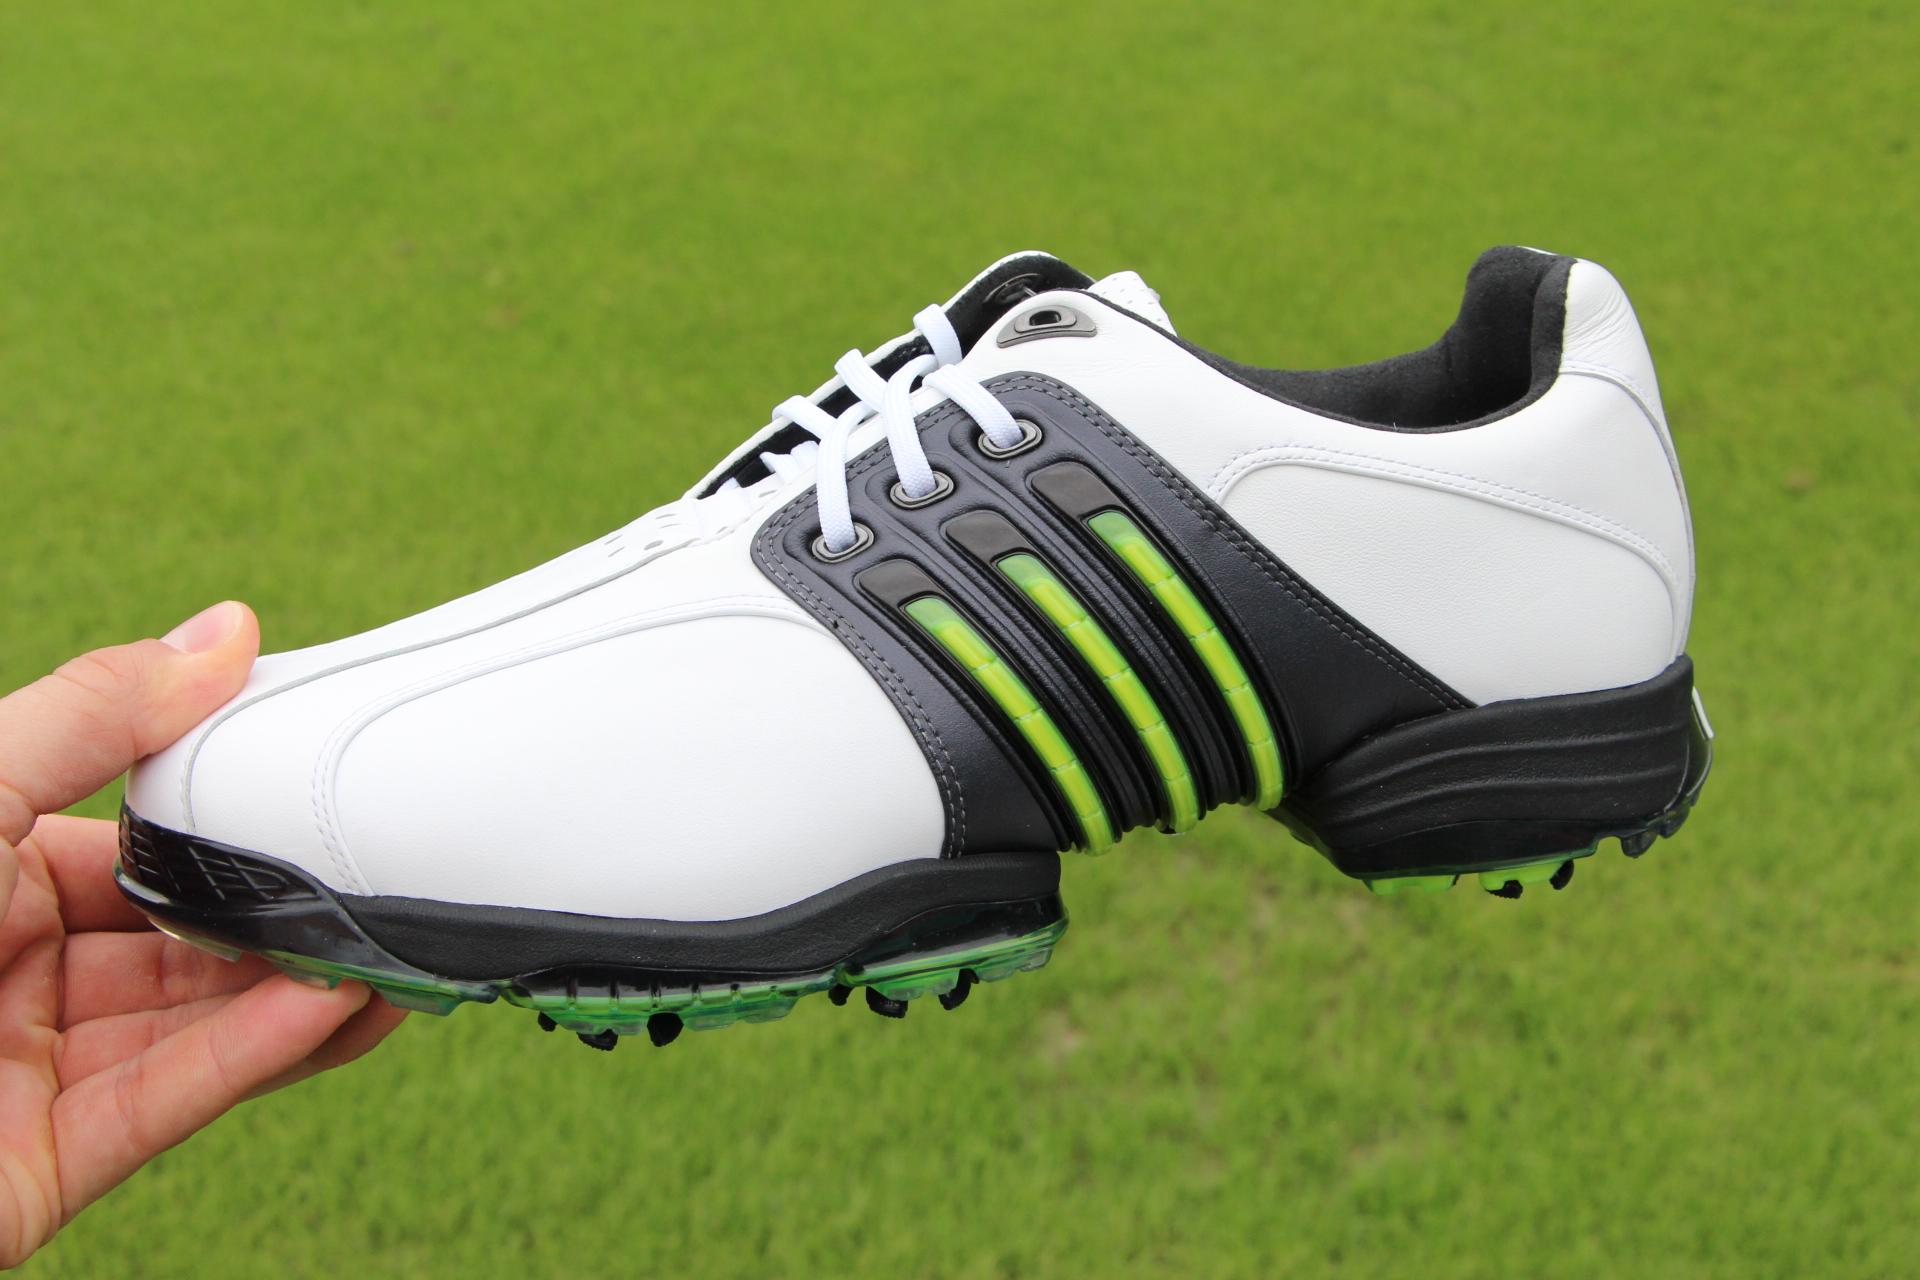 Adidas Tour 360 II Shoe